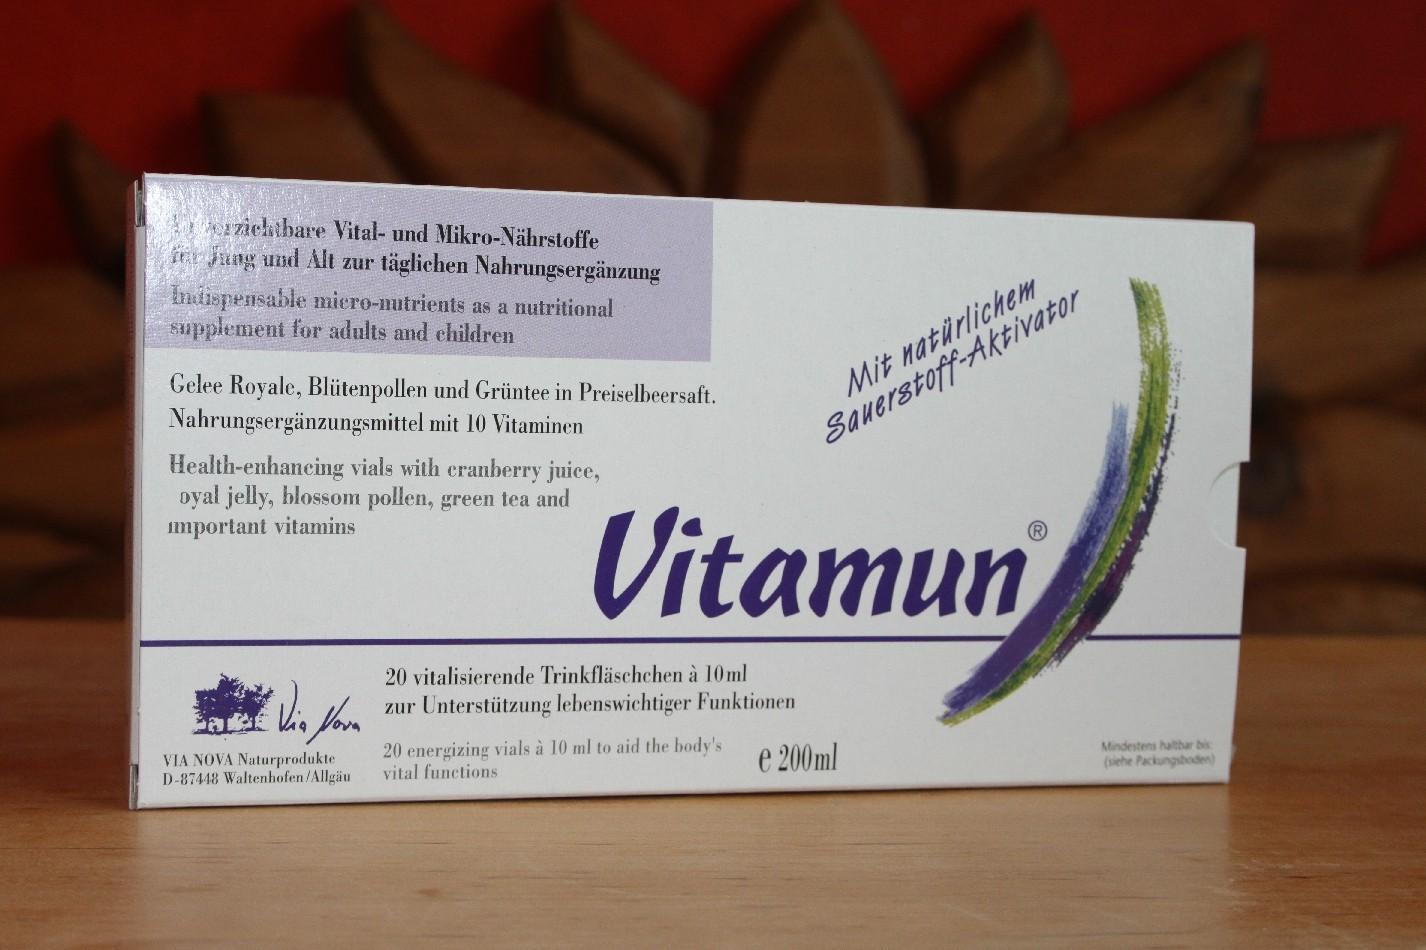 Vitamun - Kraftpaket aus der Naturohne Alkohol 20 Ampullen